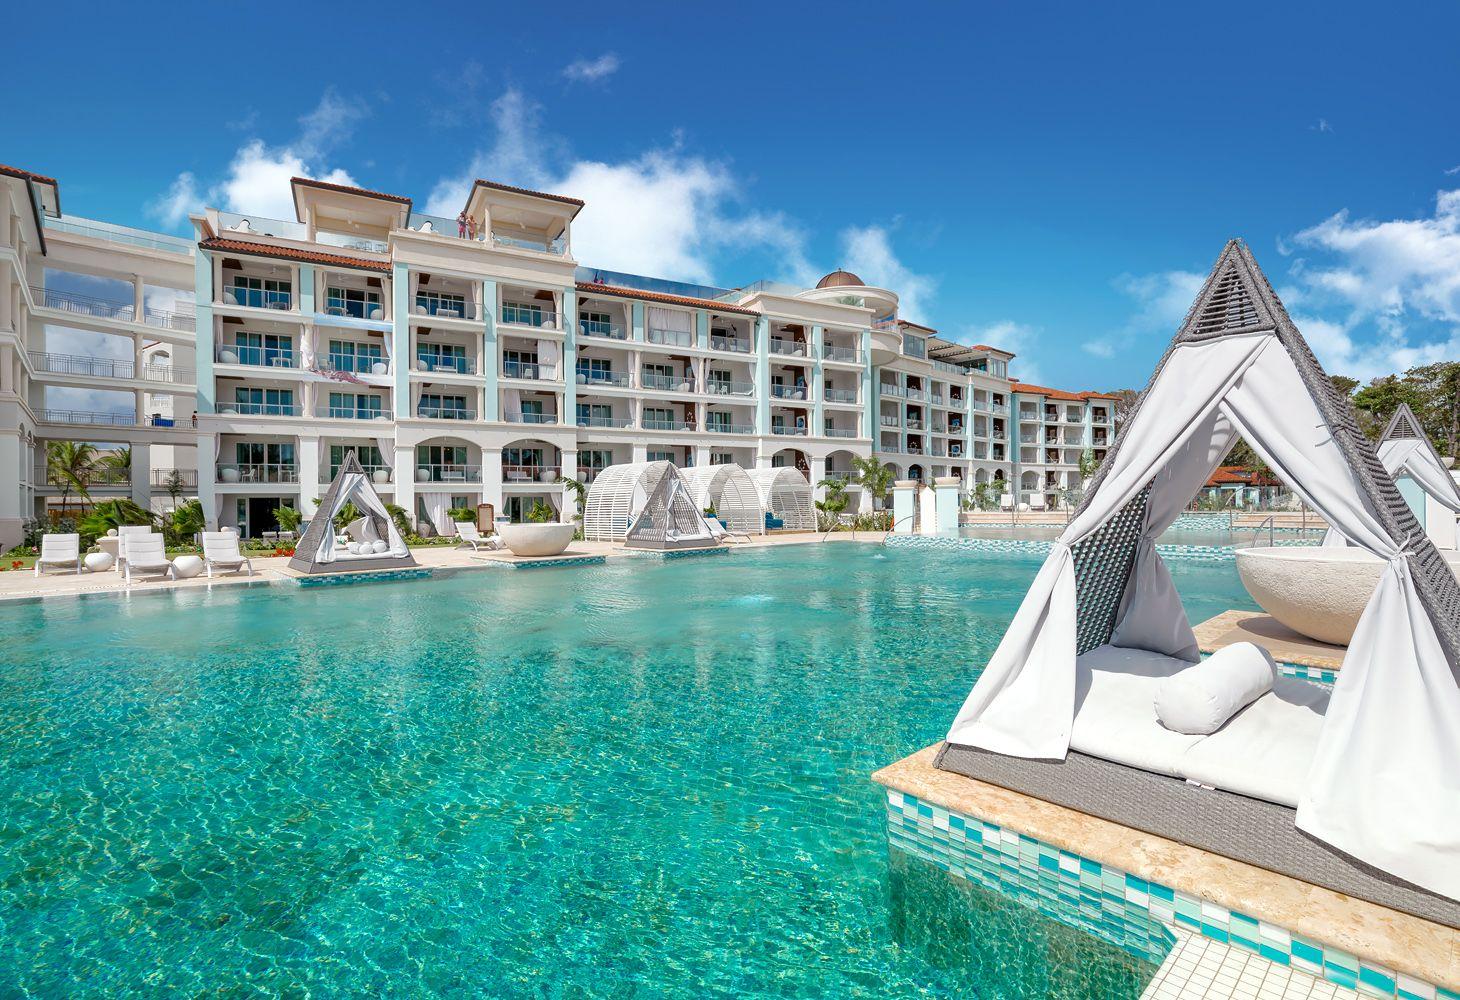 Sandals Royal Barbados Main Pool